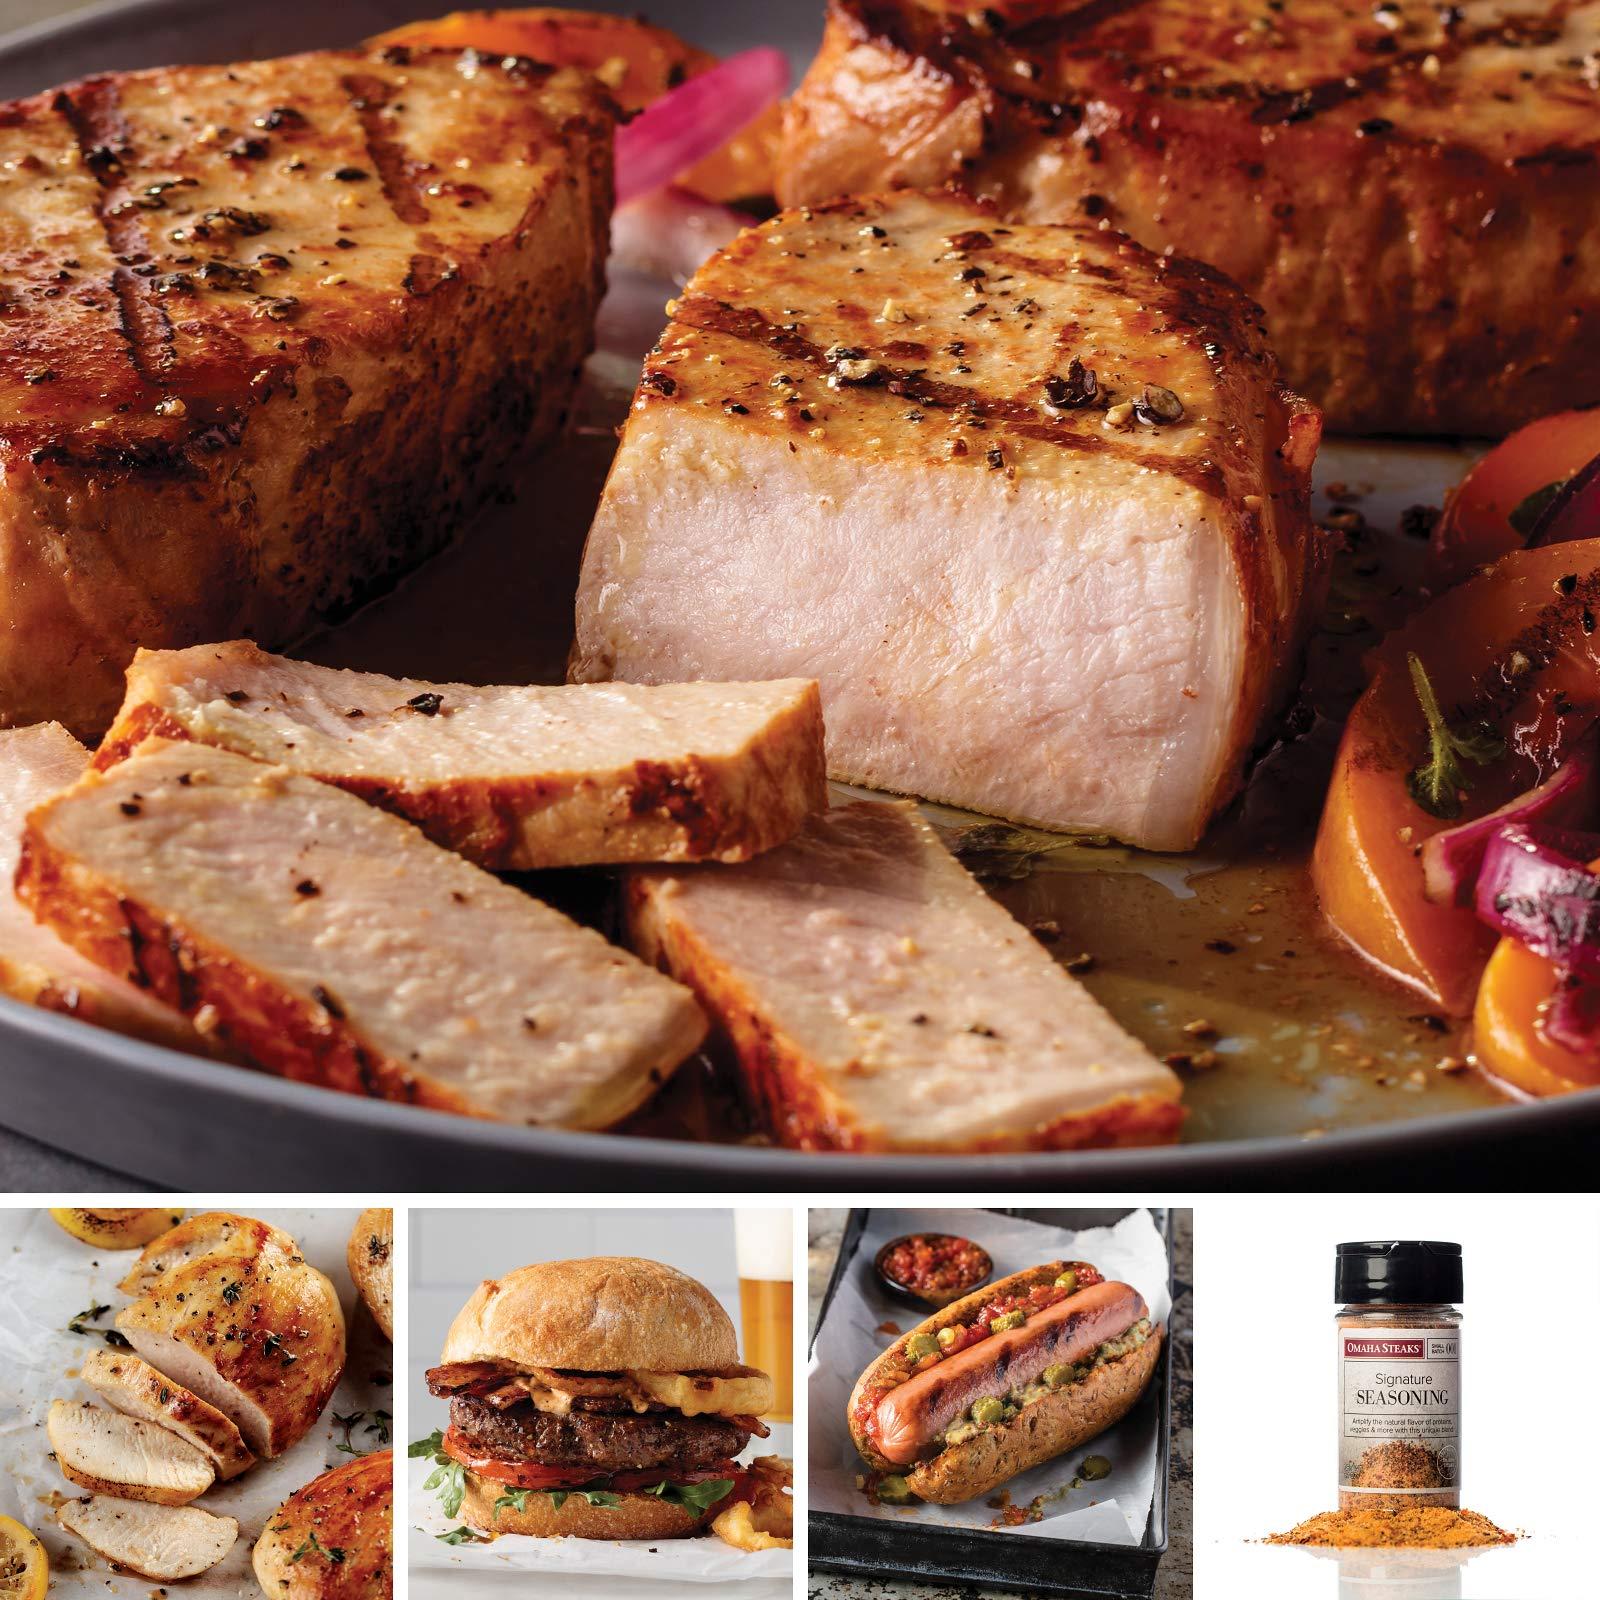 Omaha Steaks Omaha's Variety Package (13-Piece with Boneless Pork Chops, Boneless Chicken Breasts, Steak Burgers, Jumbo Franks, and Signature Seasoning) by Omaha Steaks